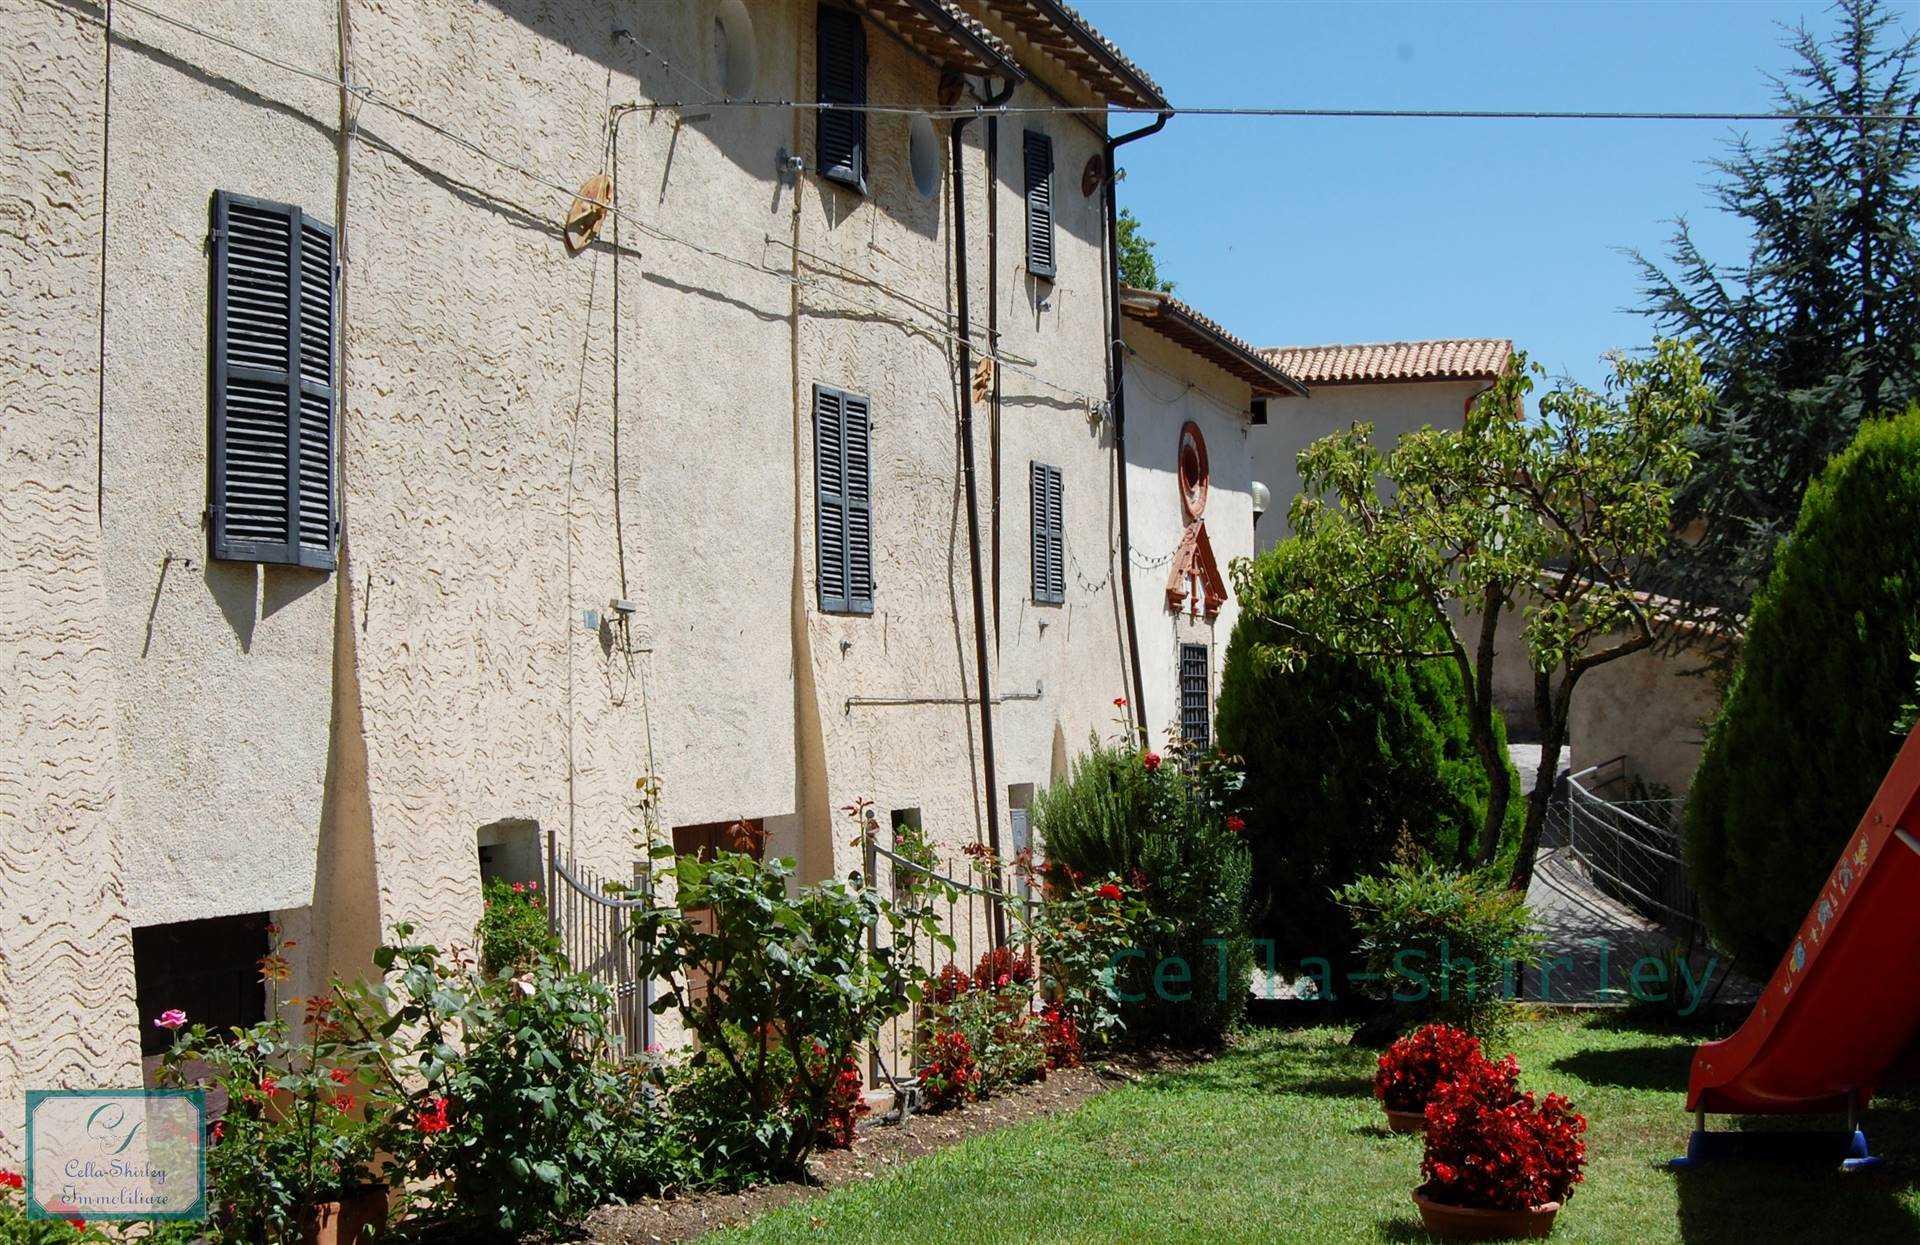 Palazzo in Pieve Torina MC